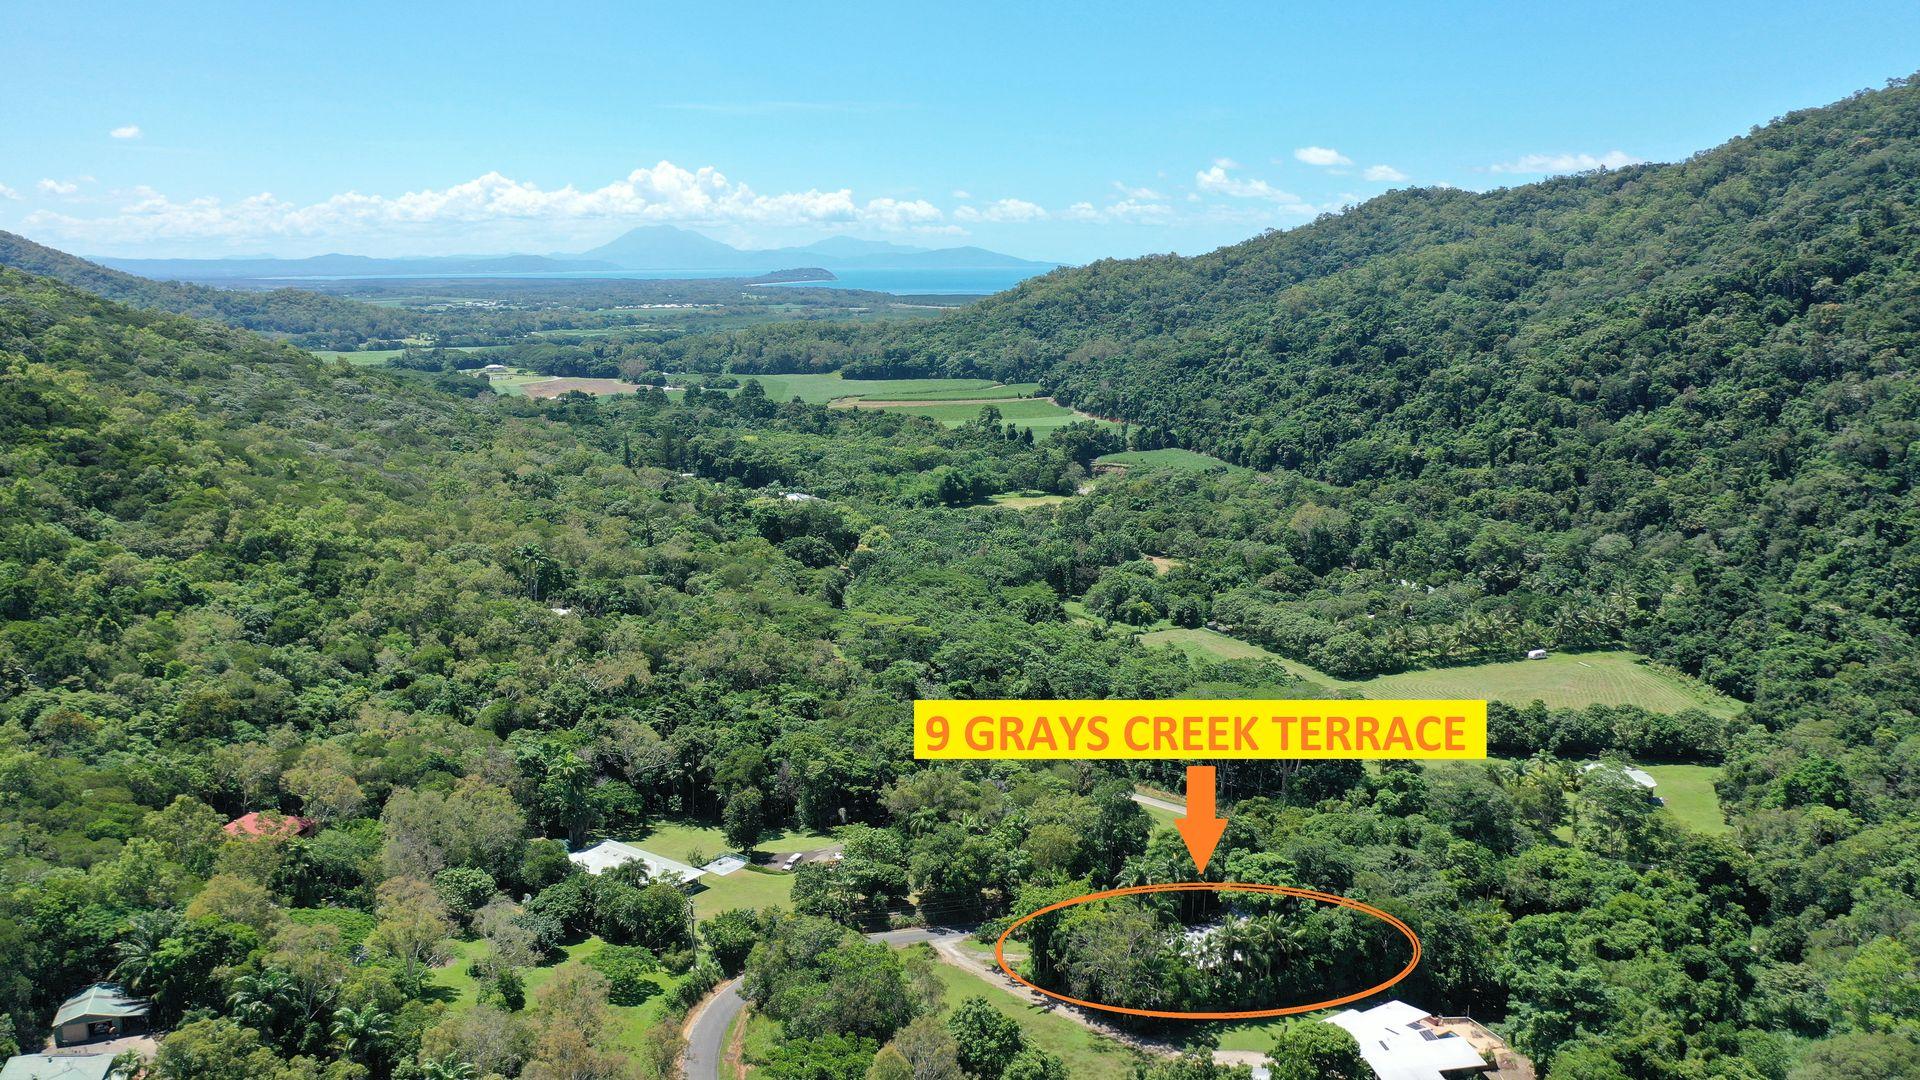 9 Grays Creek Terrace, Mowbray QLD 4877, Image 1